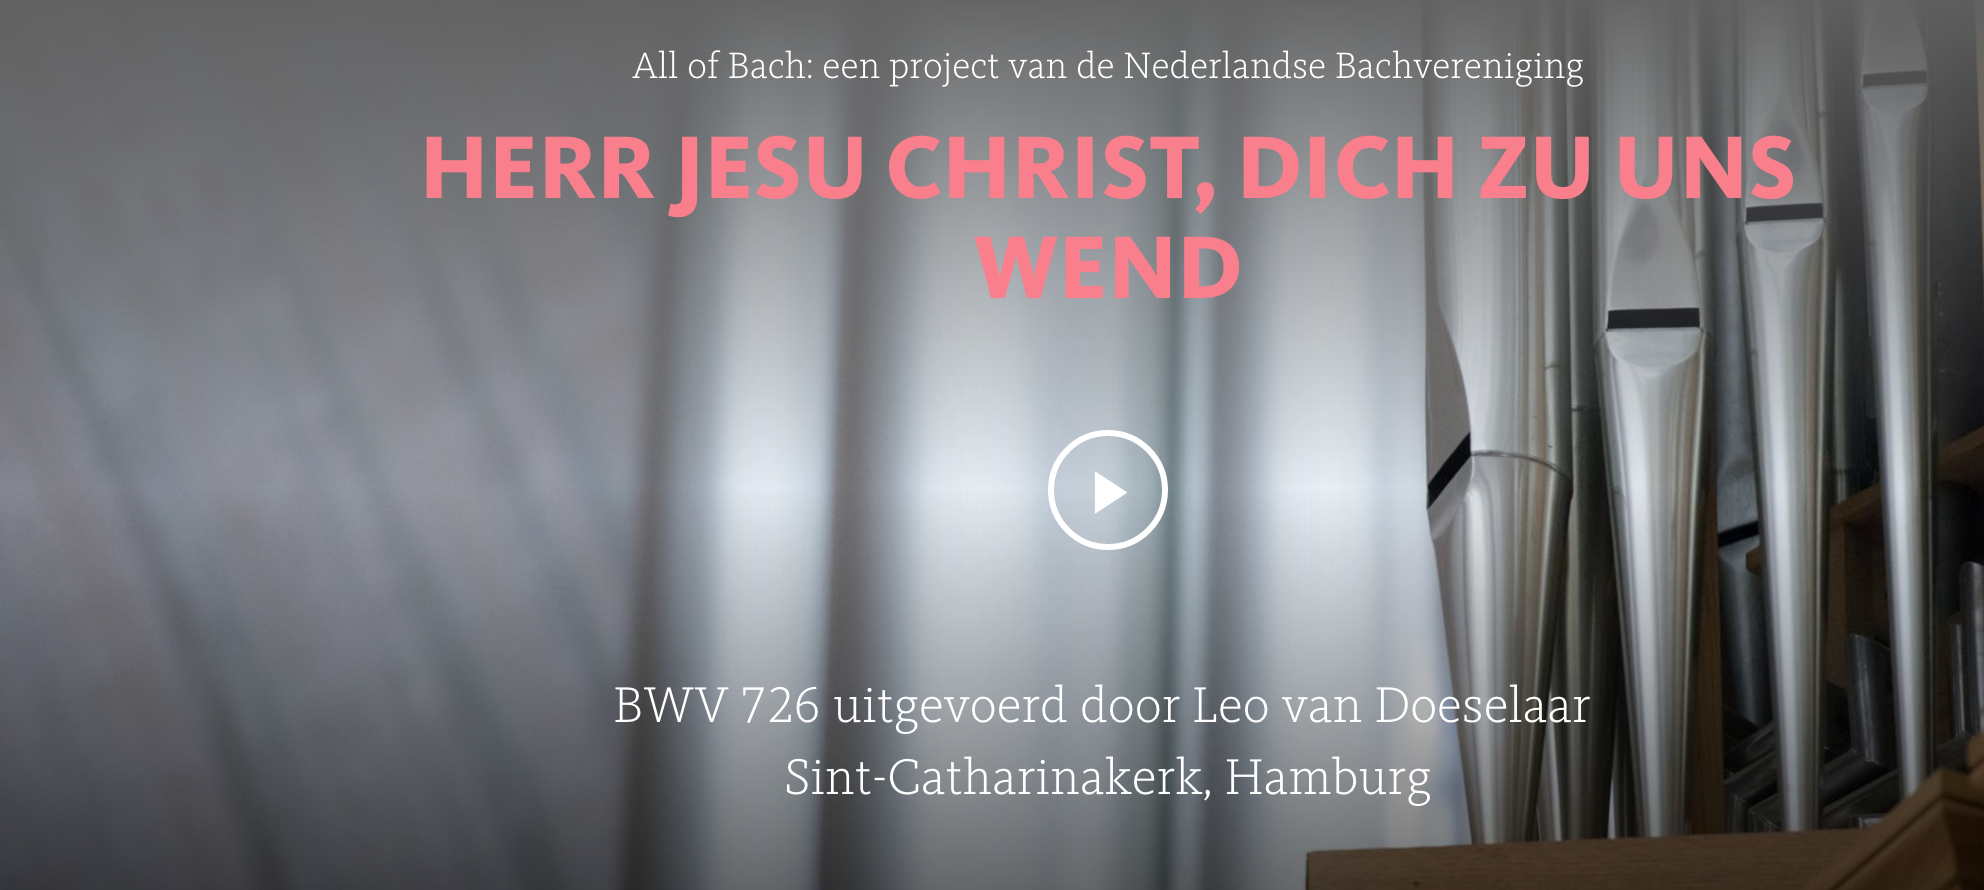 BWV 726